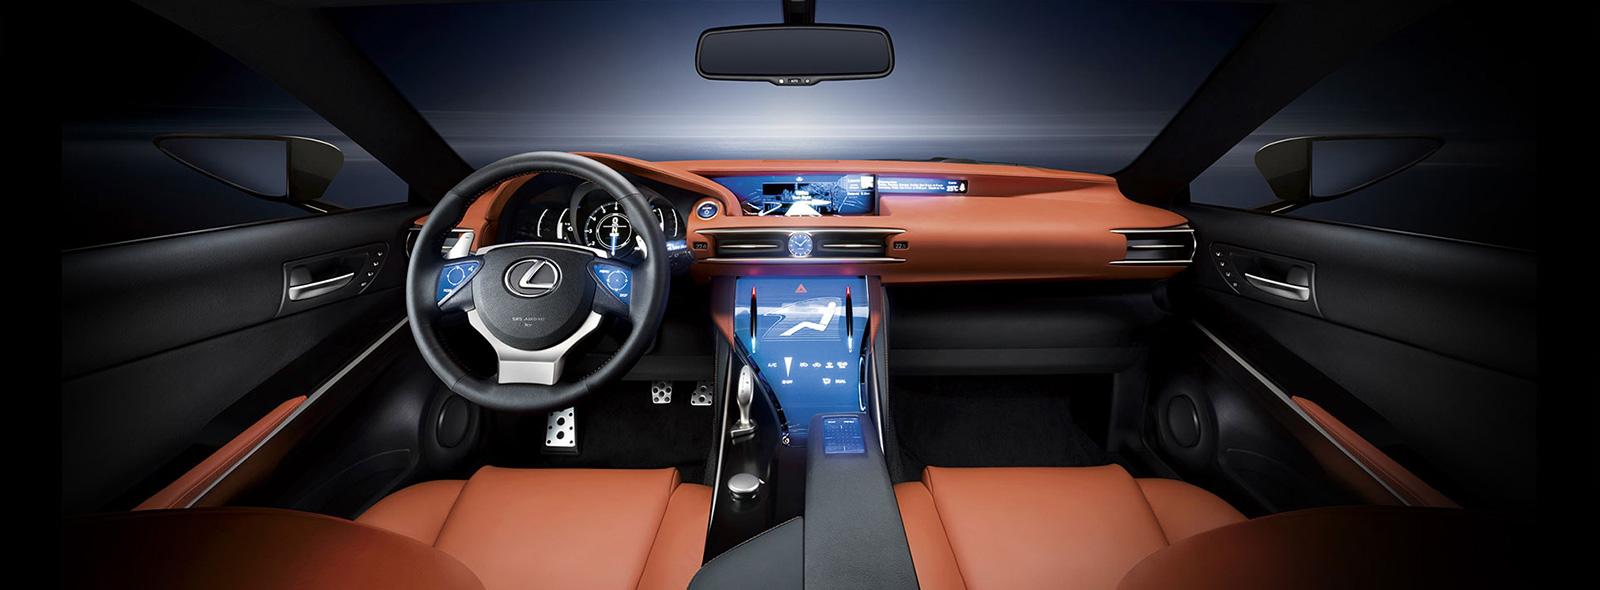 Inside Lexus LF-CC Concept Car